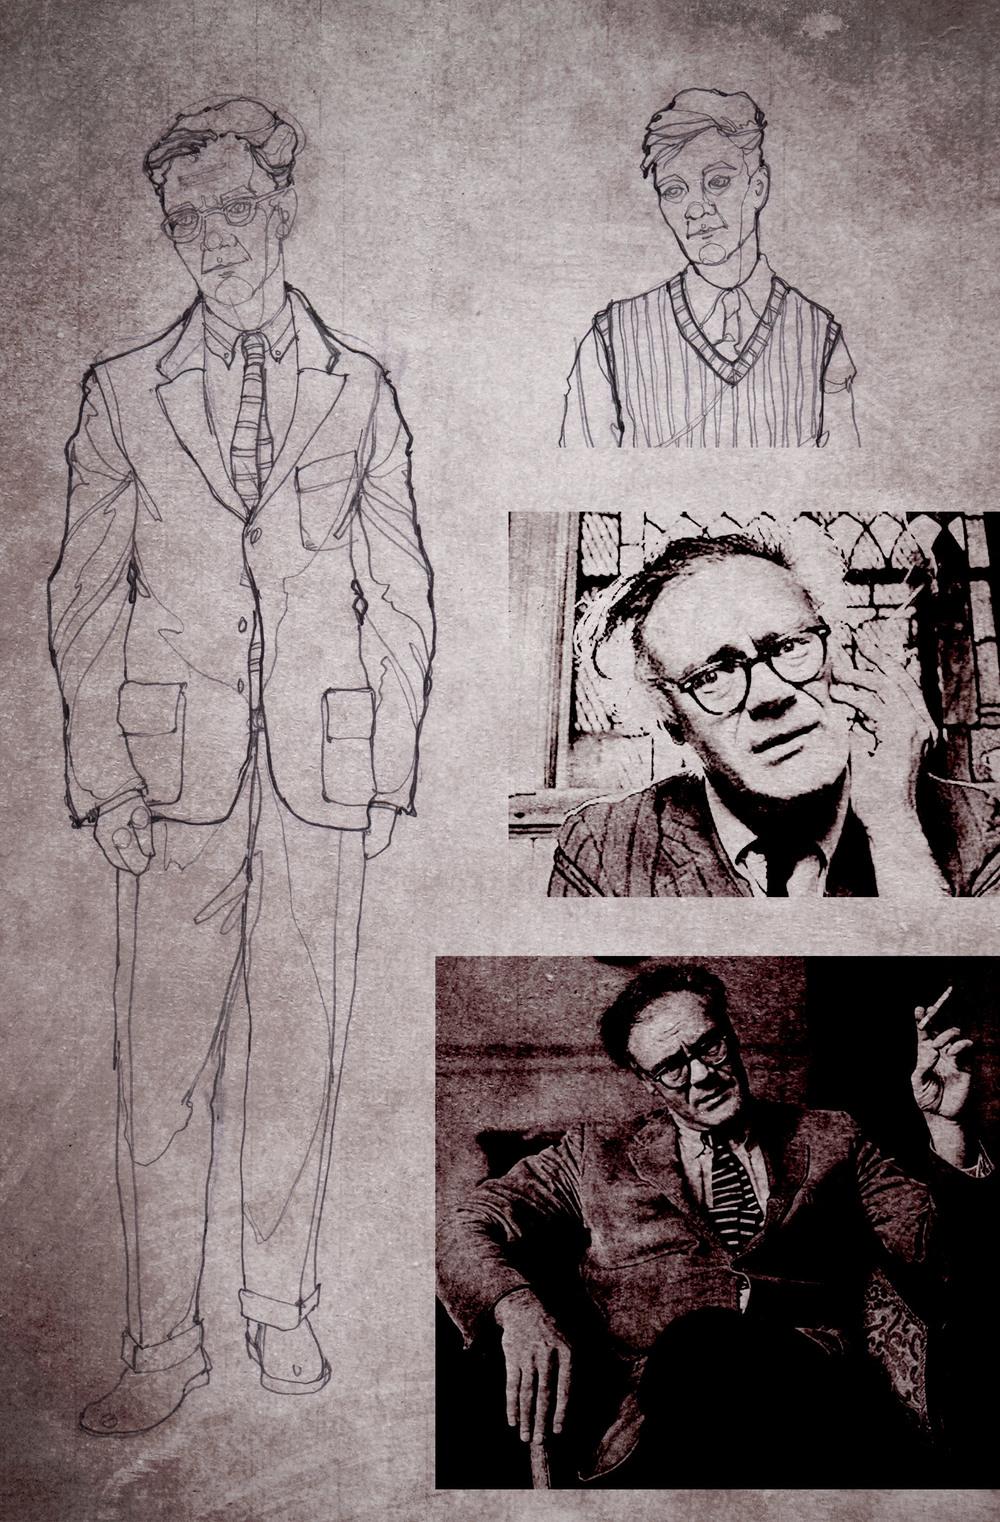 robert sketch.jpg